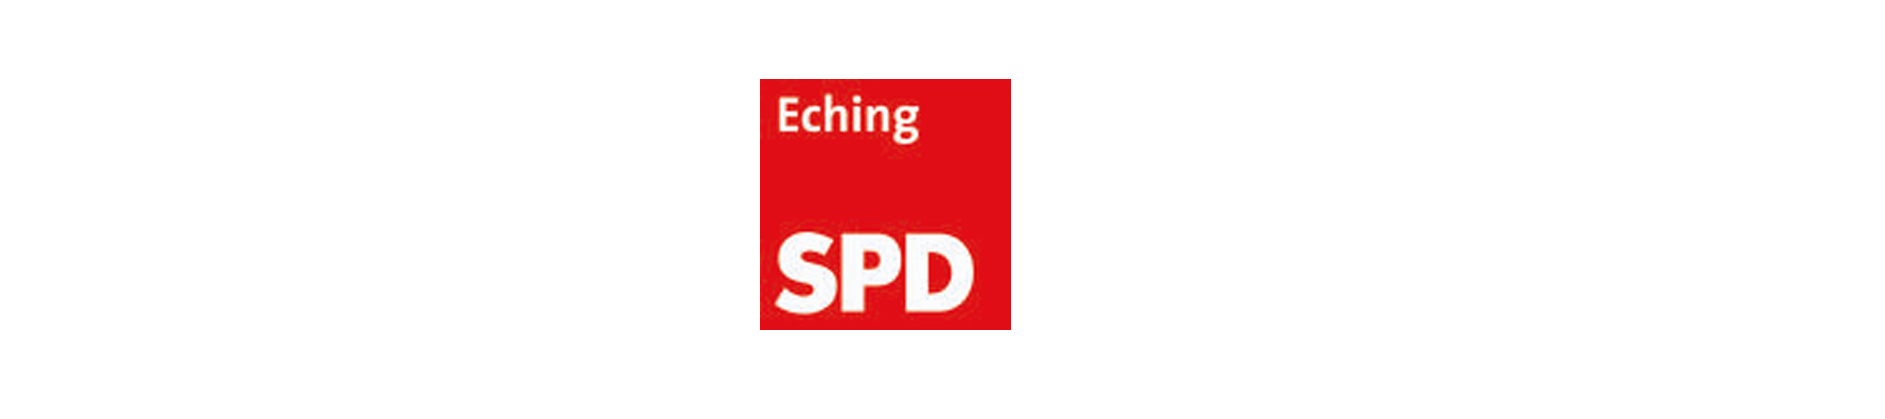 SPD_Eching